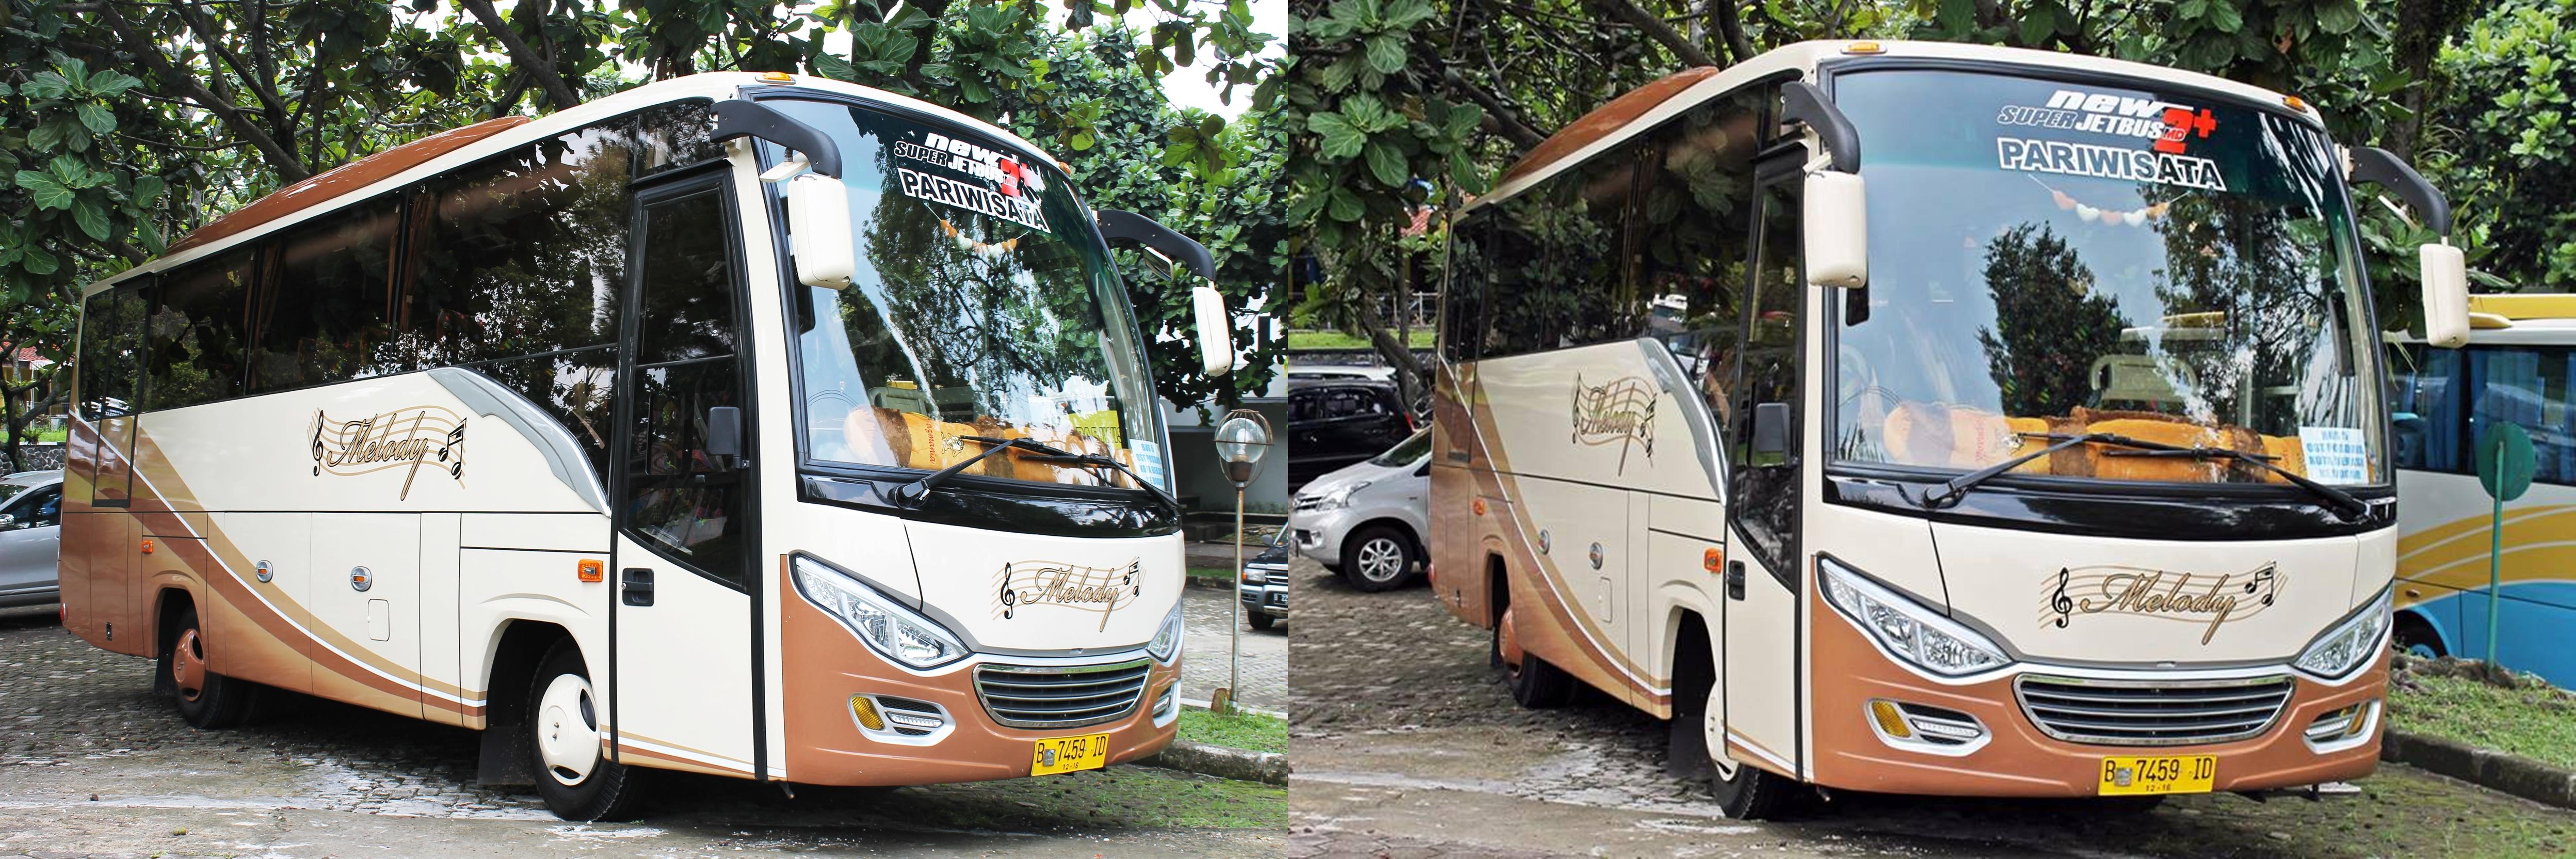 sewa bus pariwisata murah di jakarta depok tangerang bekasi medium bus bis